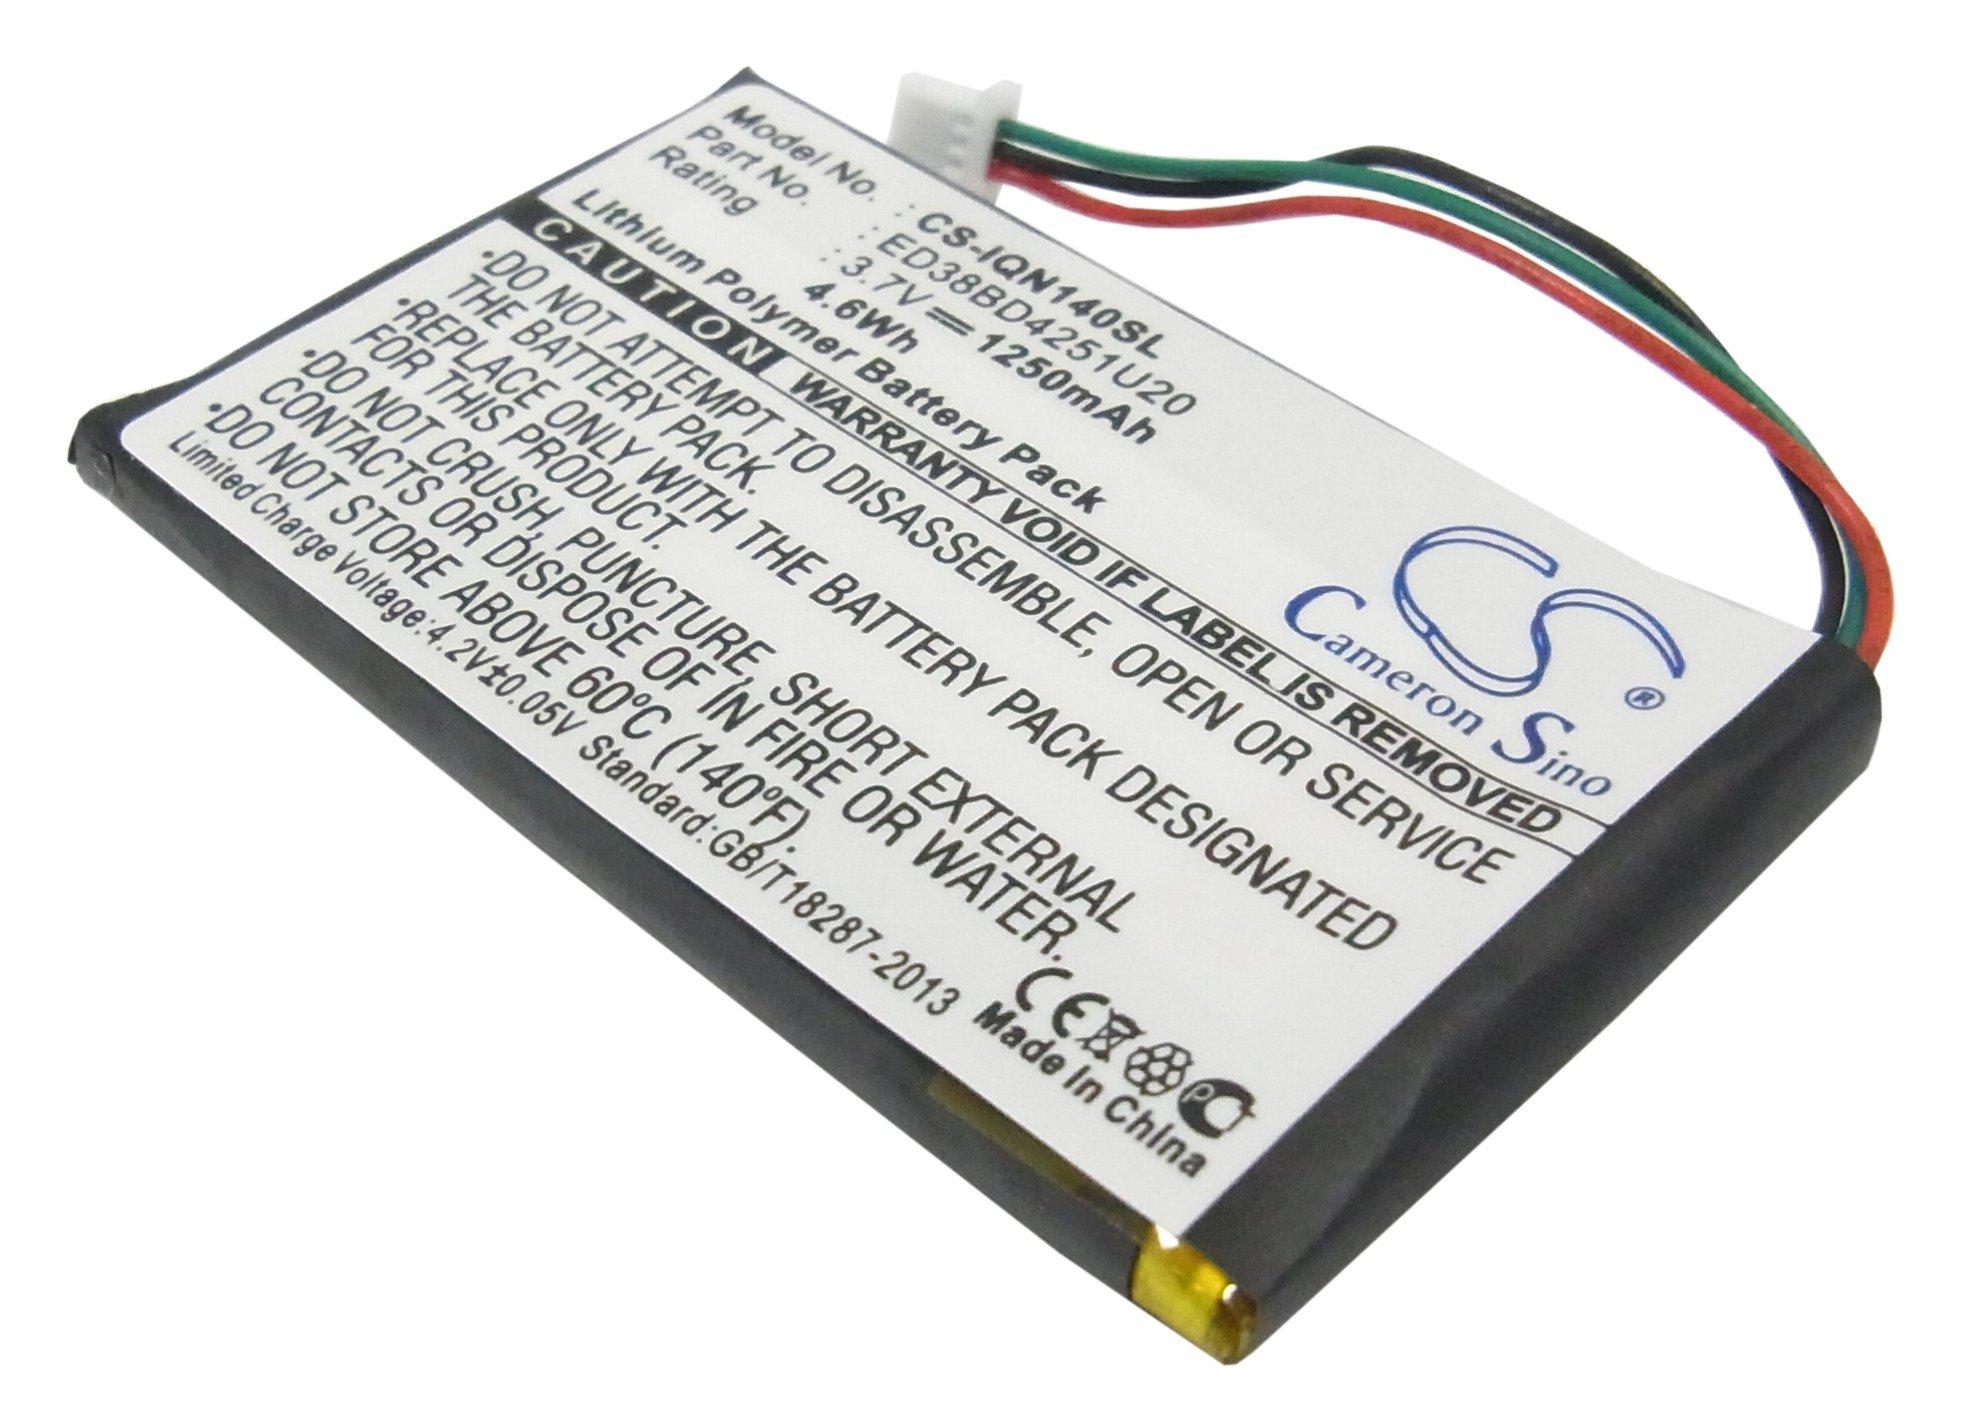 Аккумулятор для GPS-навигатора Garmin 3,7V 1250mAh код 008.01002